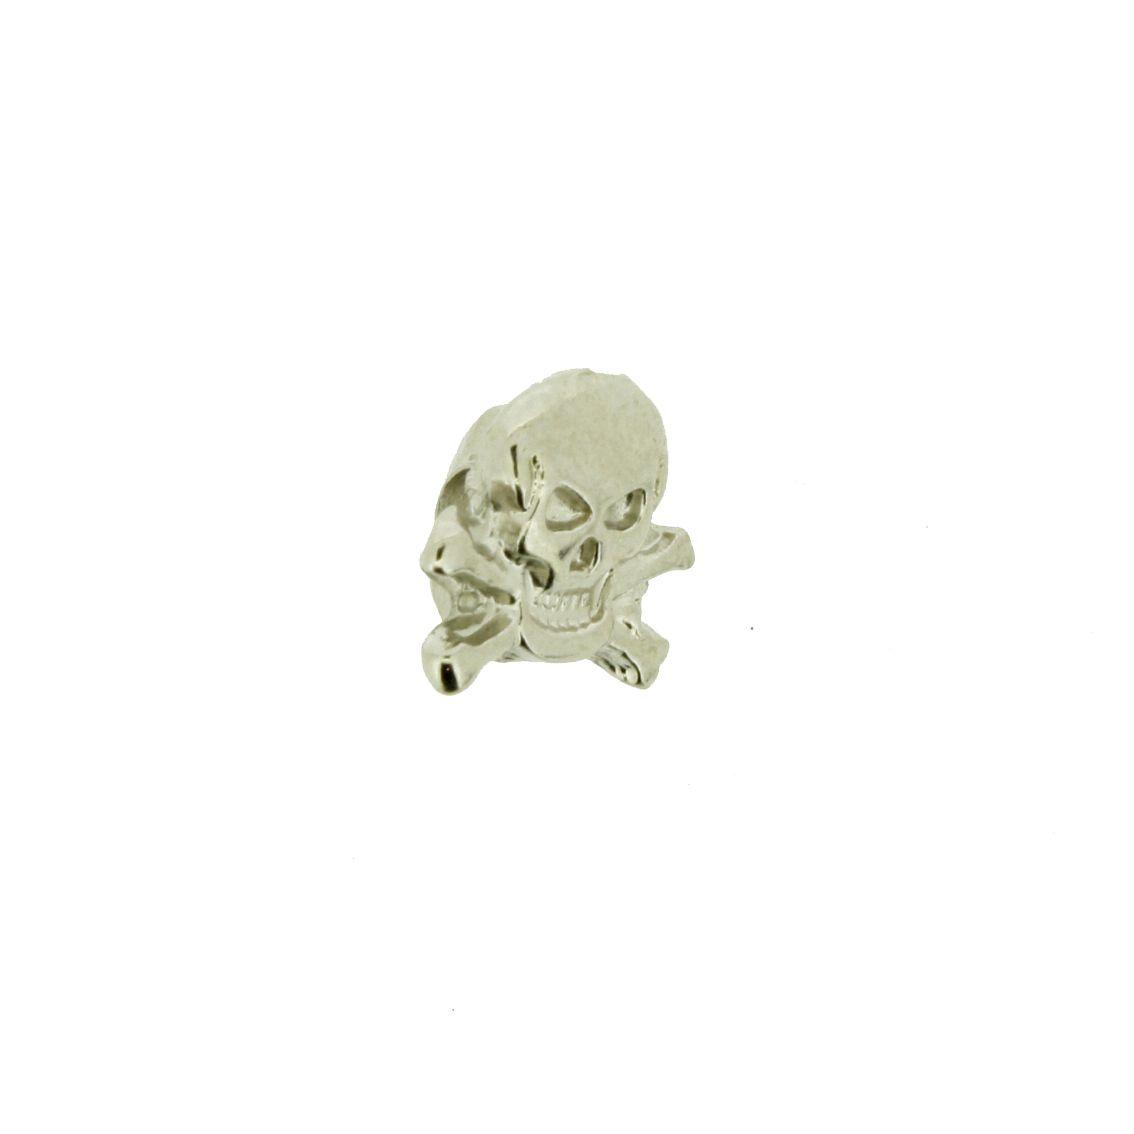 Caveira - Níquel - 10mm - 01 Peça  - Stéphanie Bijoux® - Peças para Bijuterias e Artesanato